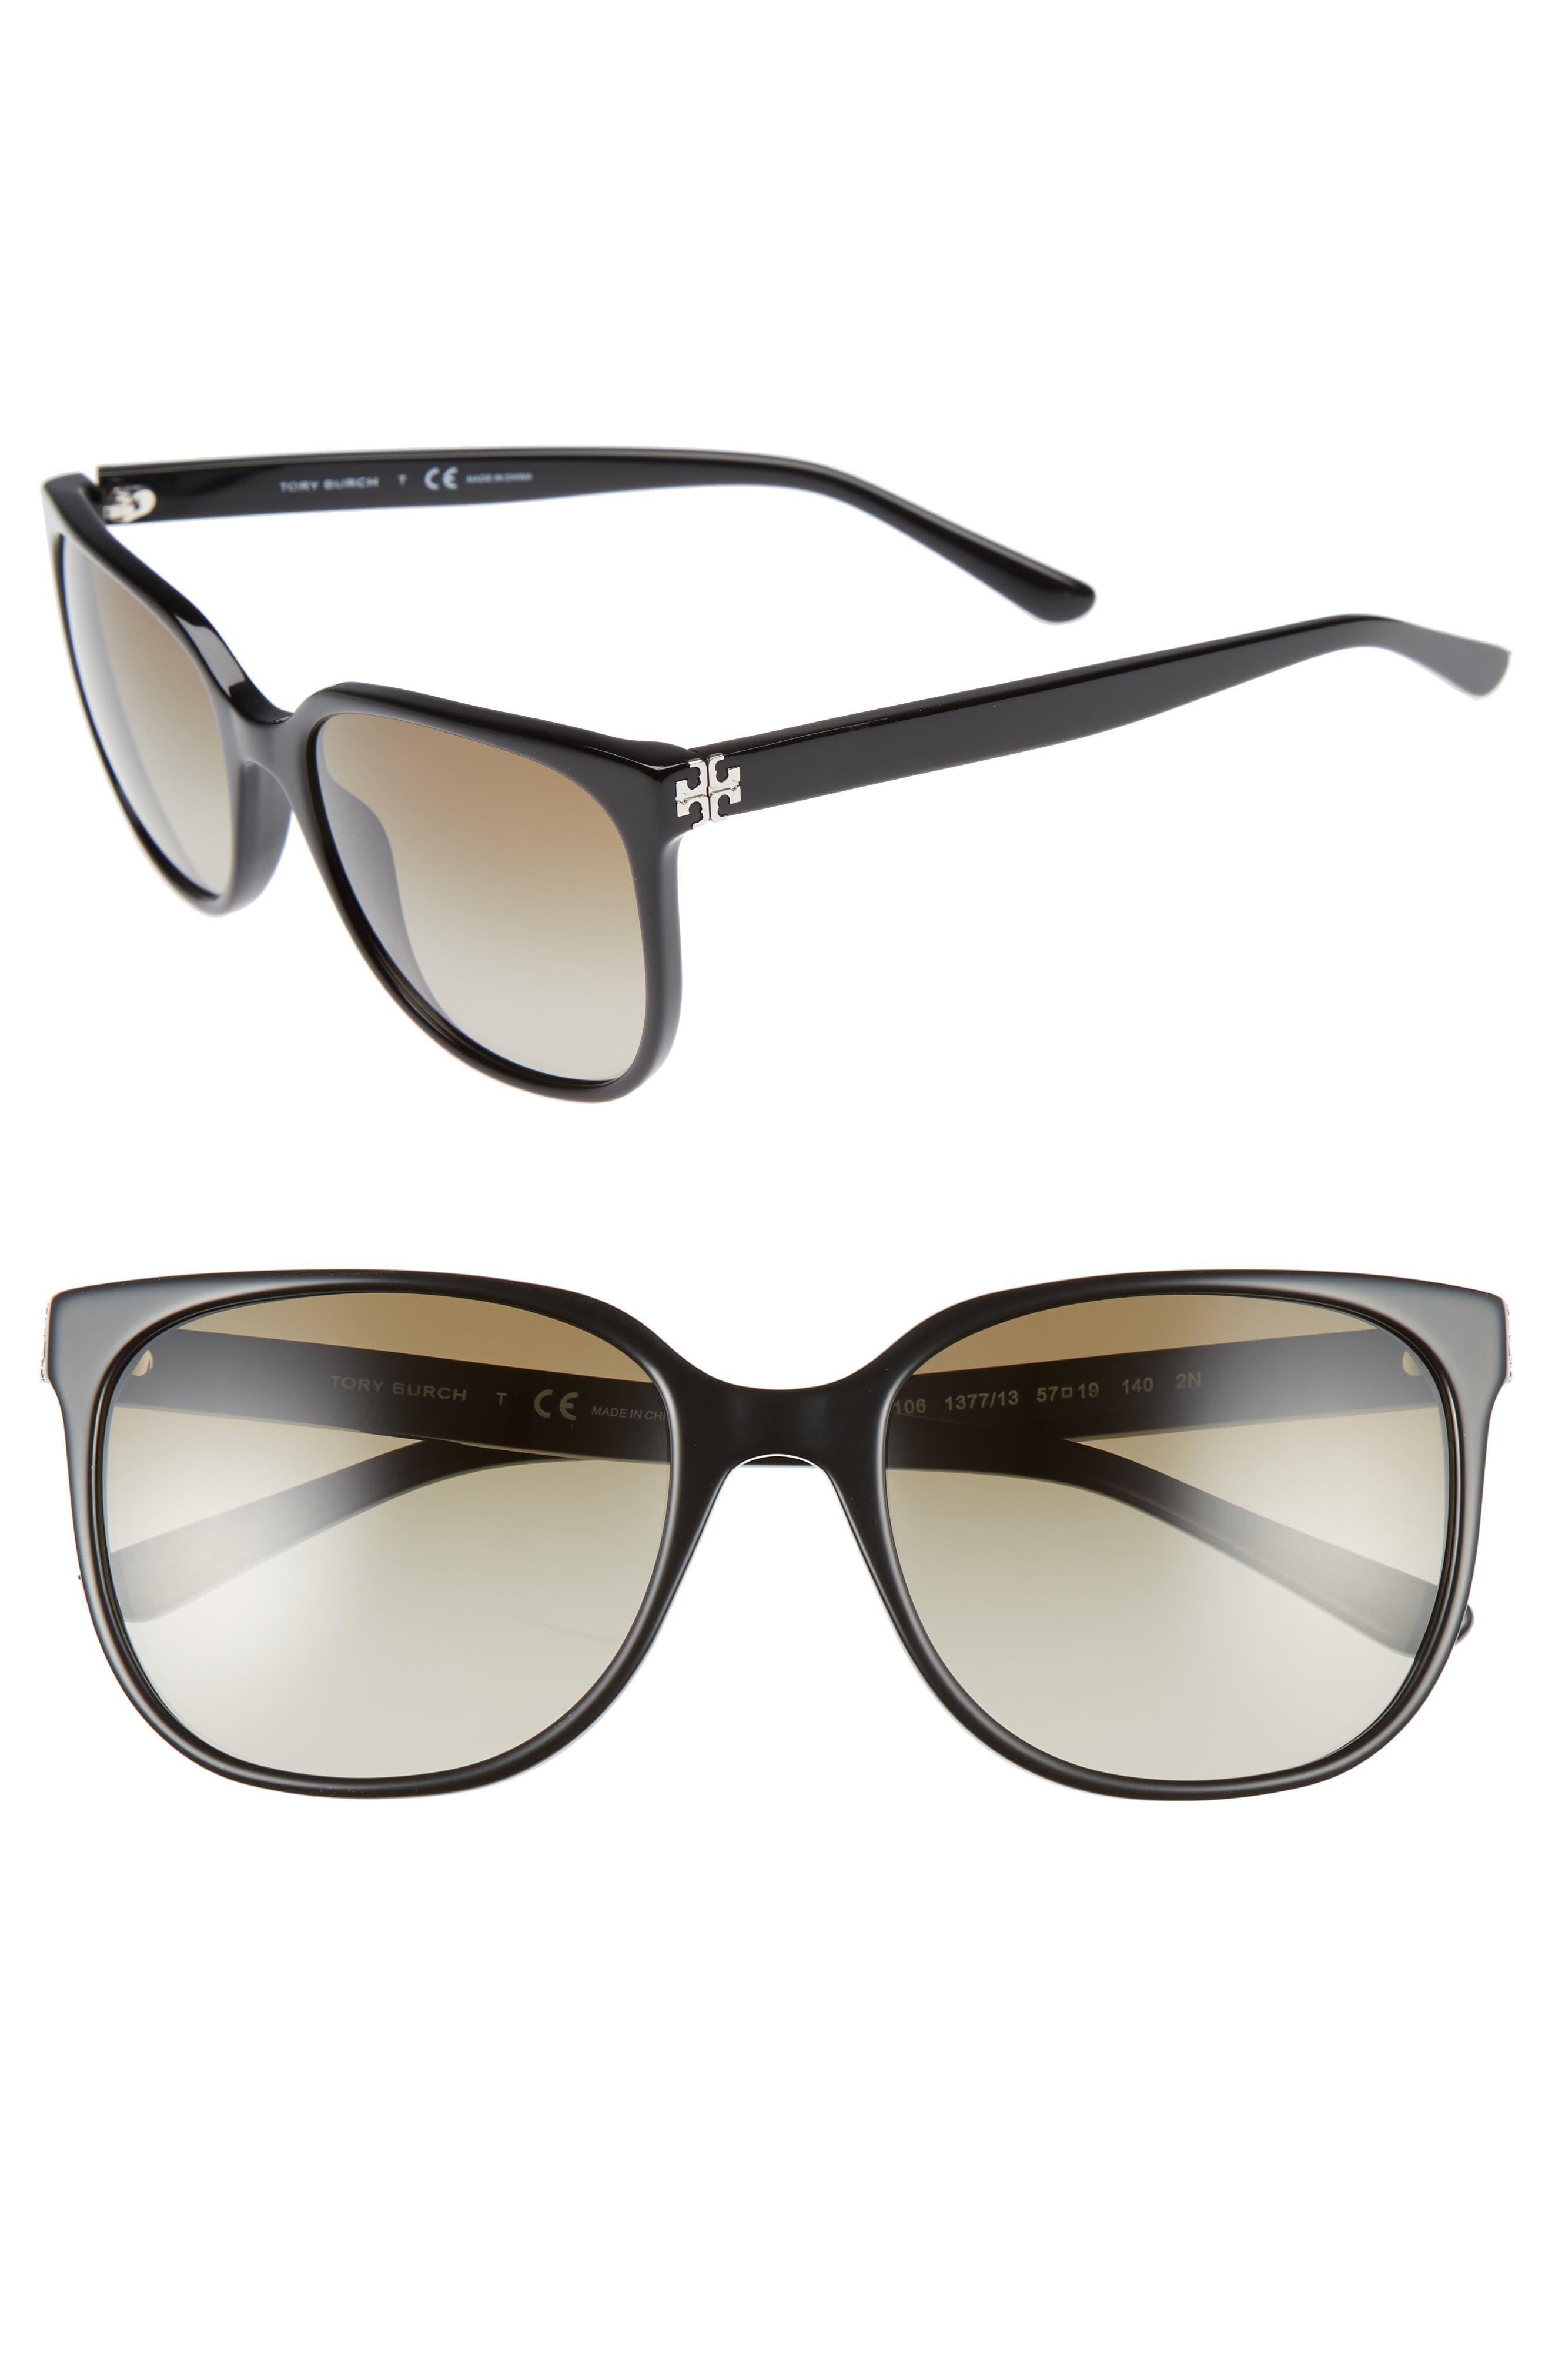 Alternate Image 1 Selected - Tory Burch 57mm Gradient Sunglasses